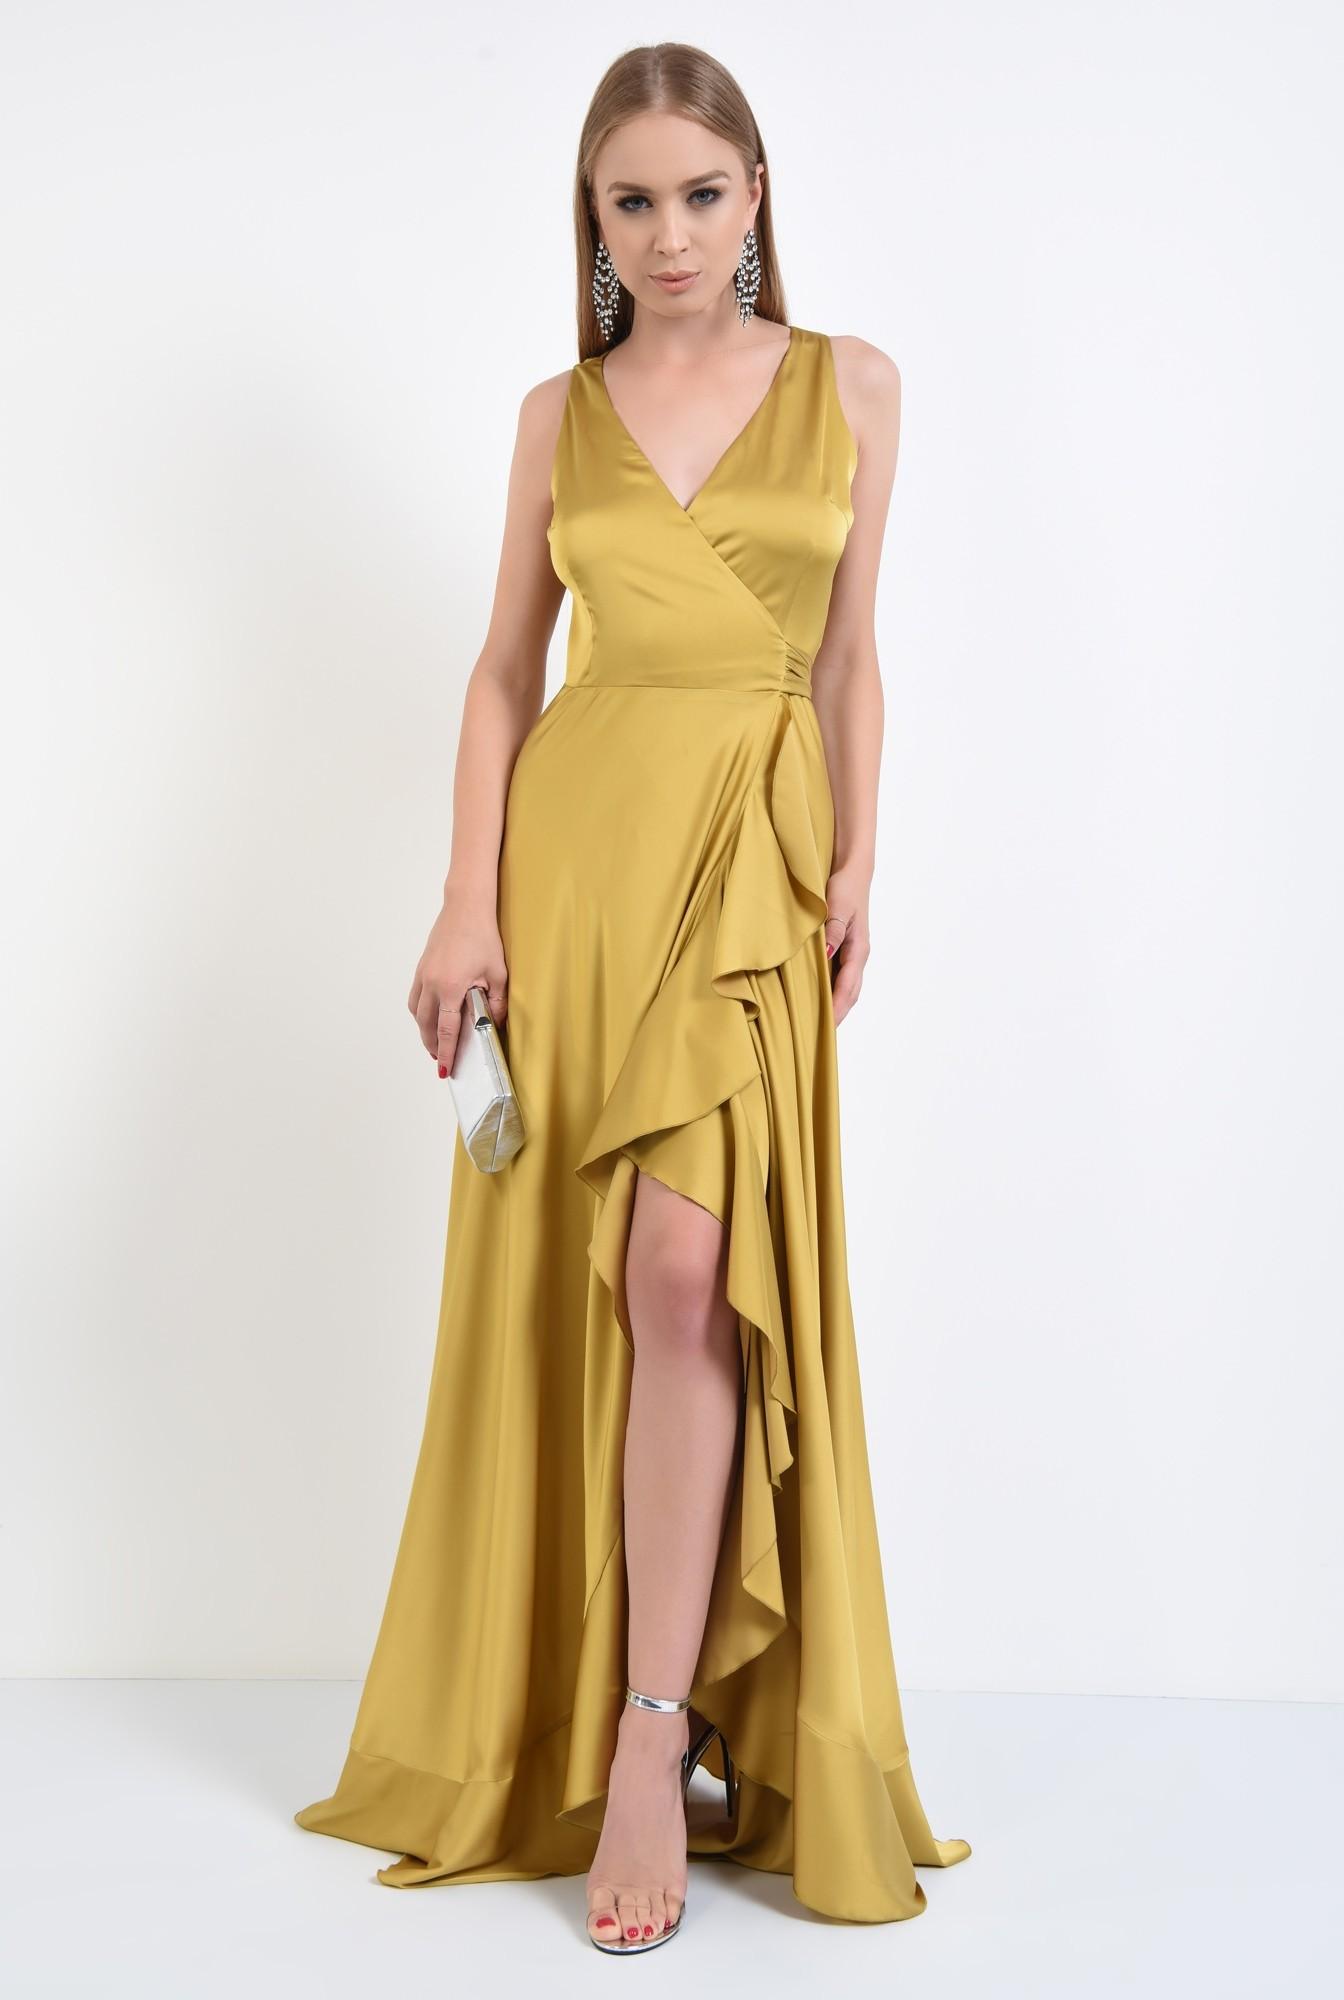 3 - rochie de seara, maxi, anchior, parte peste parte